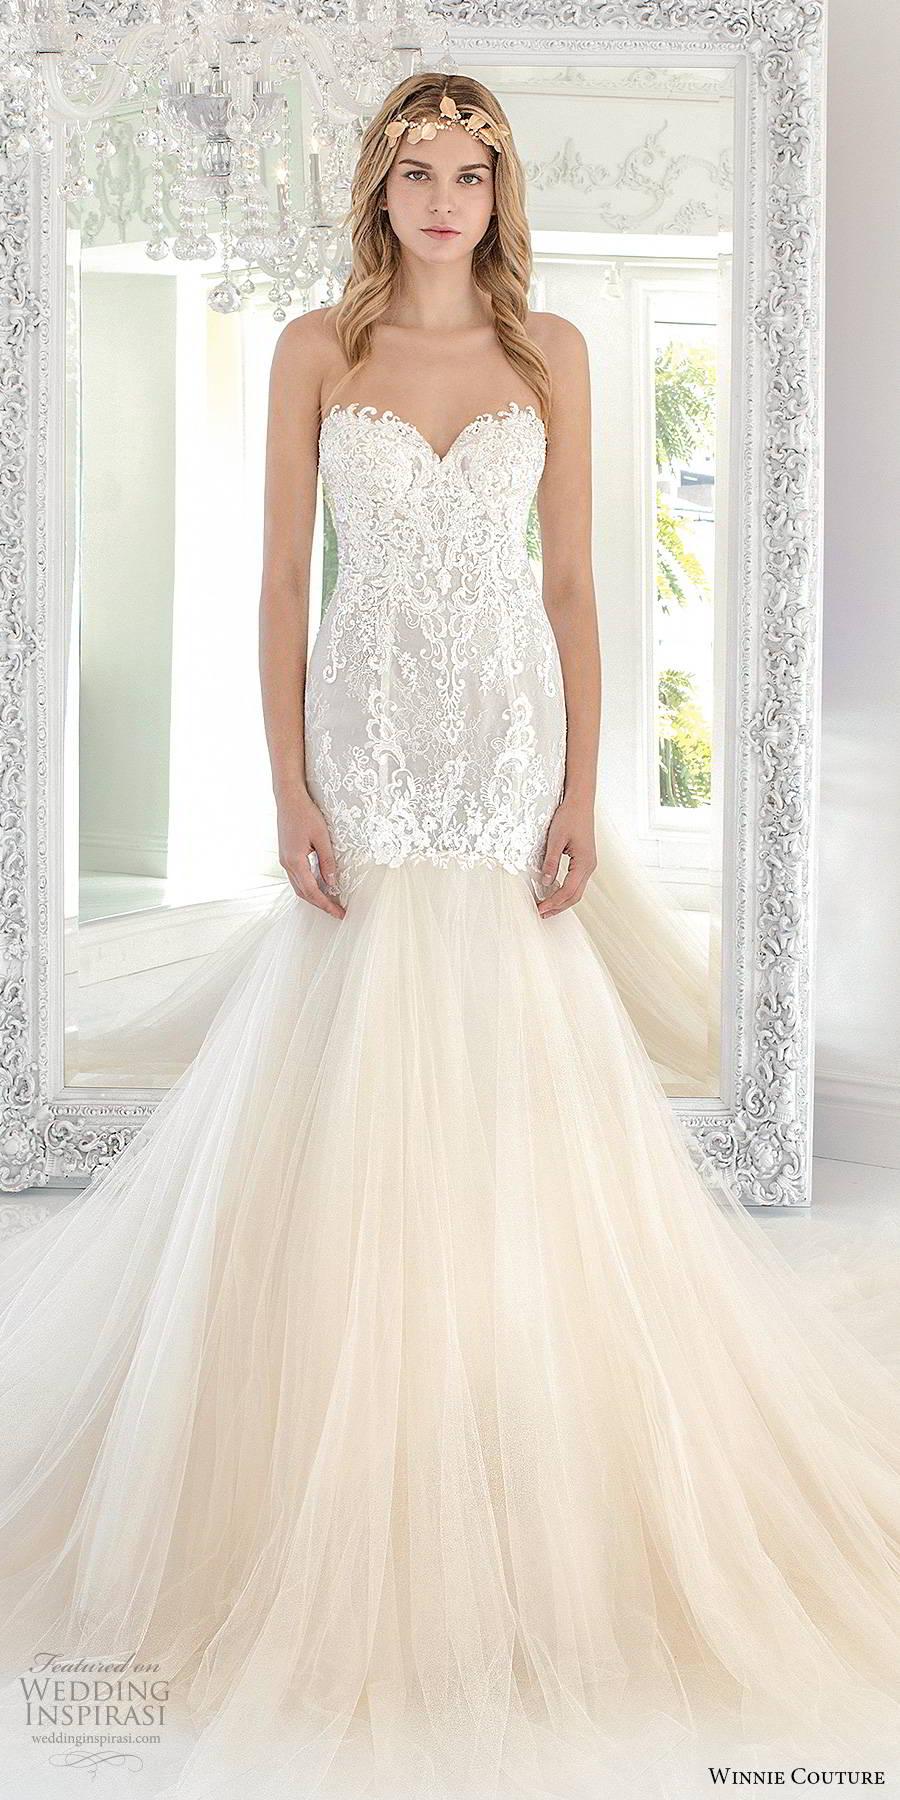 winnie couture 2019 bridal strapless sweetheart neckline heavily embellished bodice elegant fit flare mermaid wedding dress chapel train (15) mv